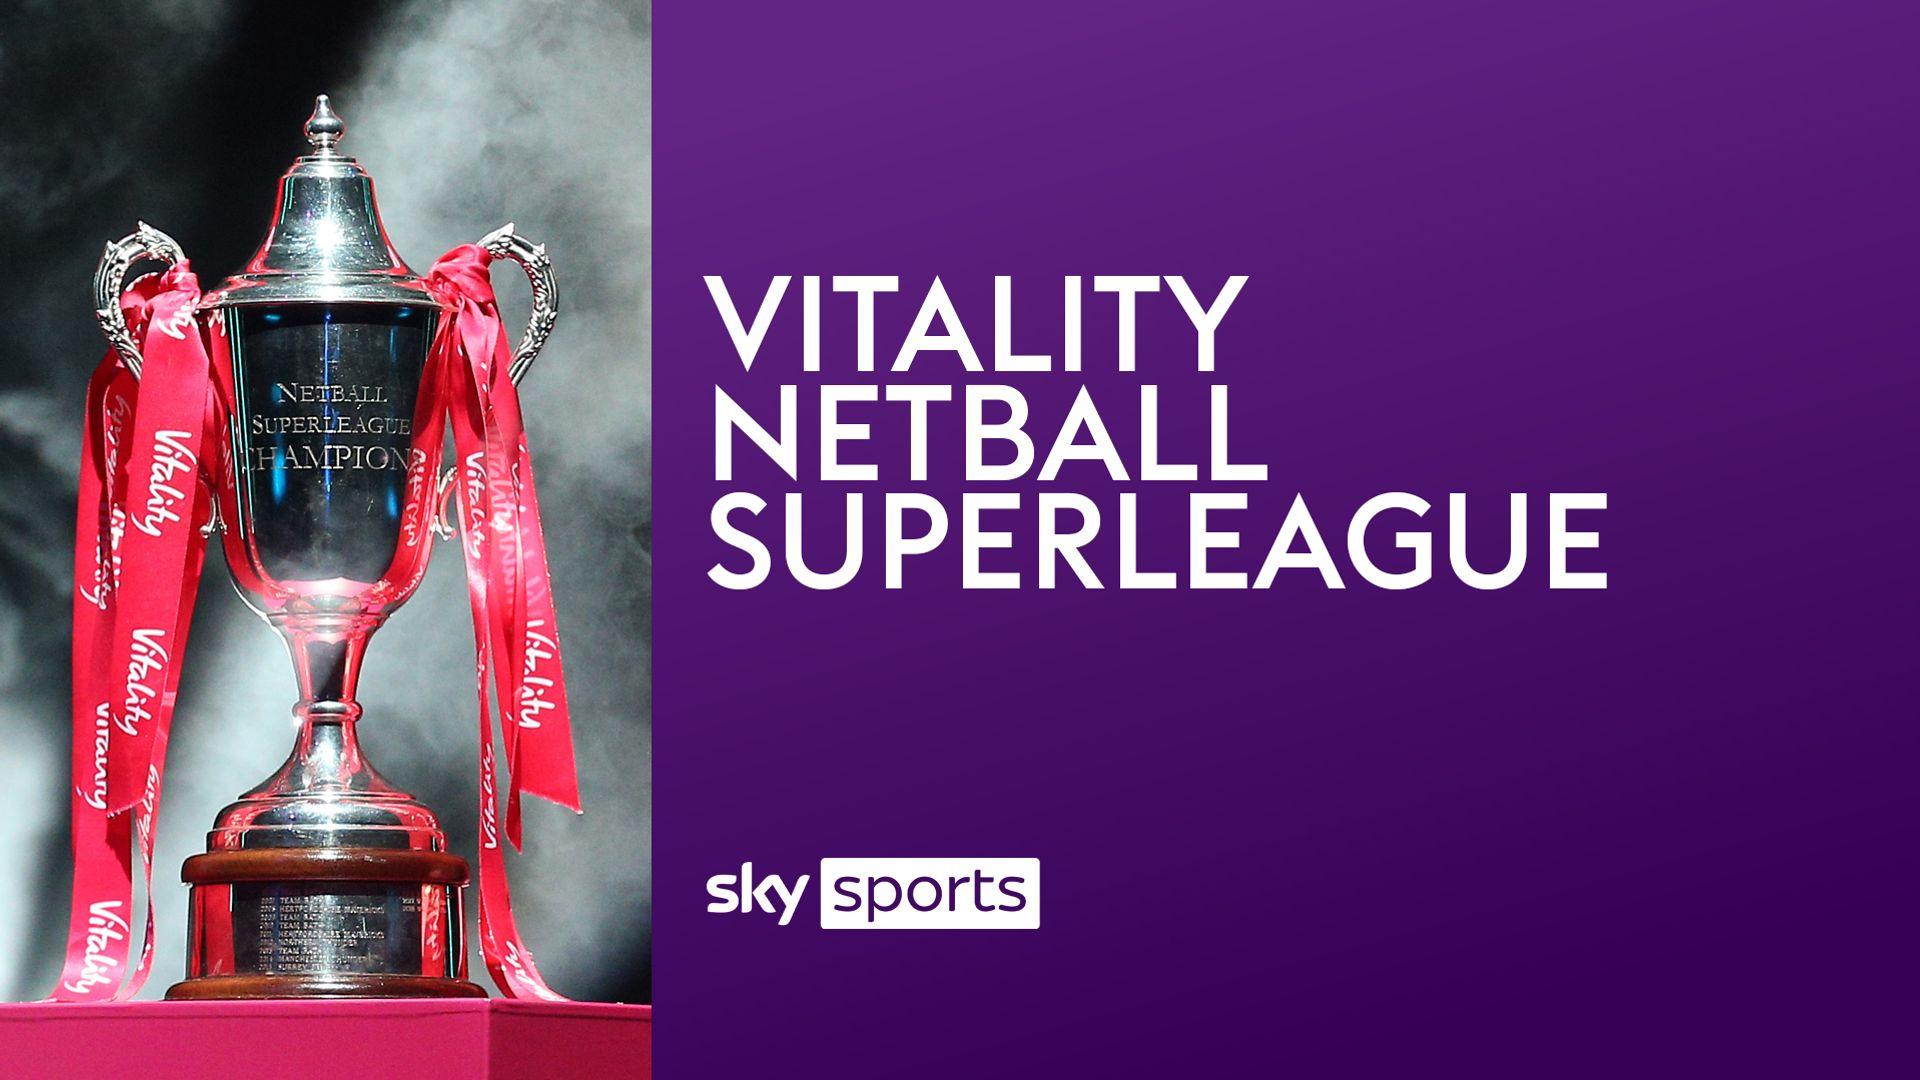 skysports-netball-superleague_5271141.jpg?20210225111102